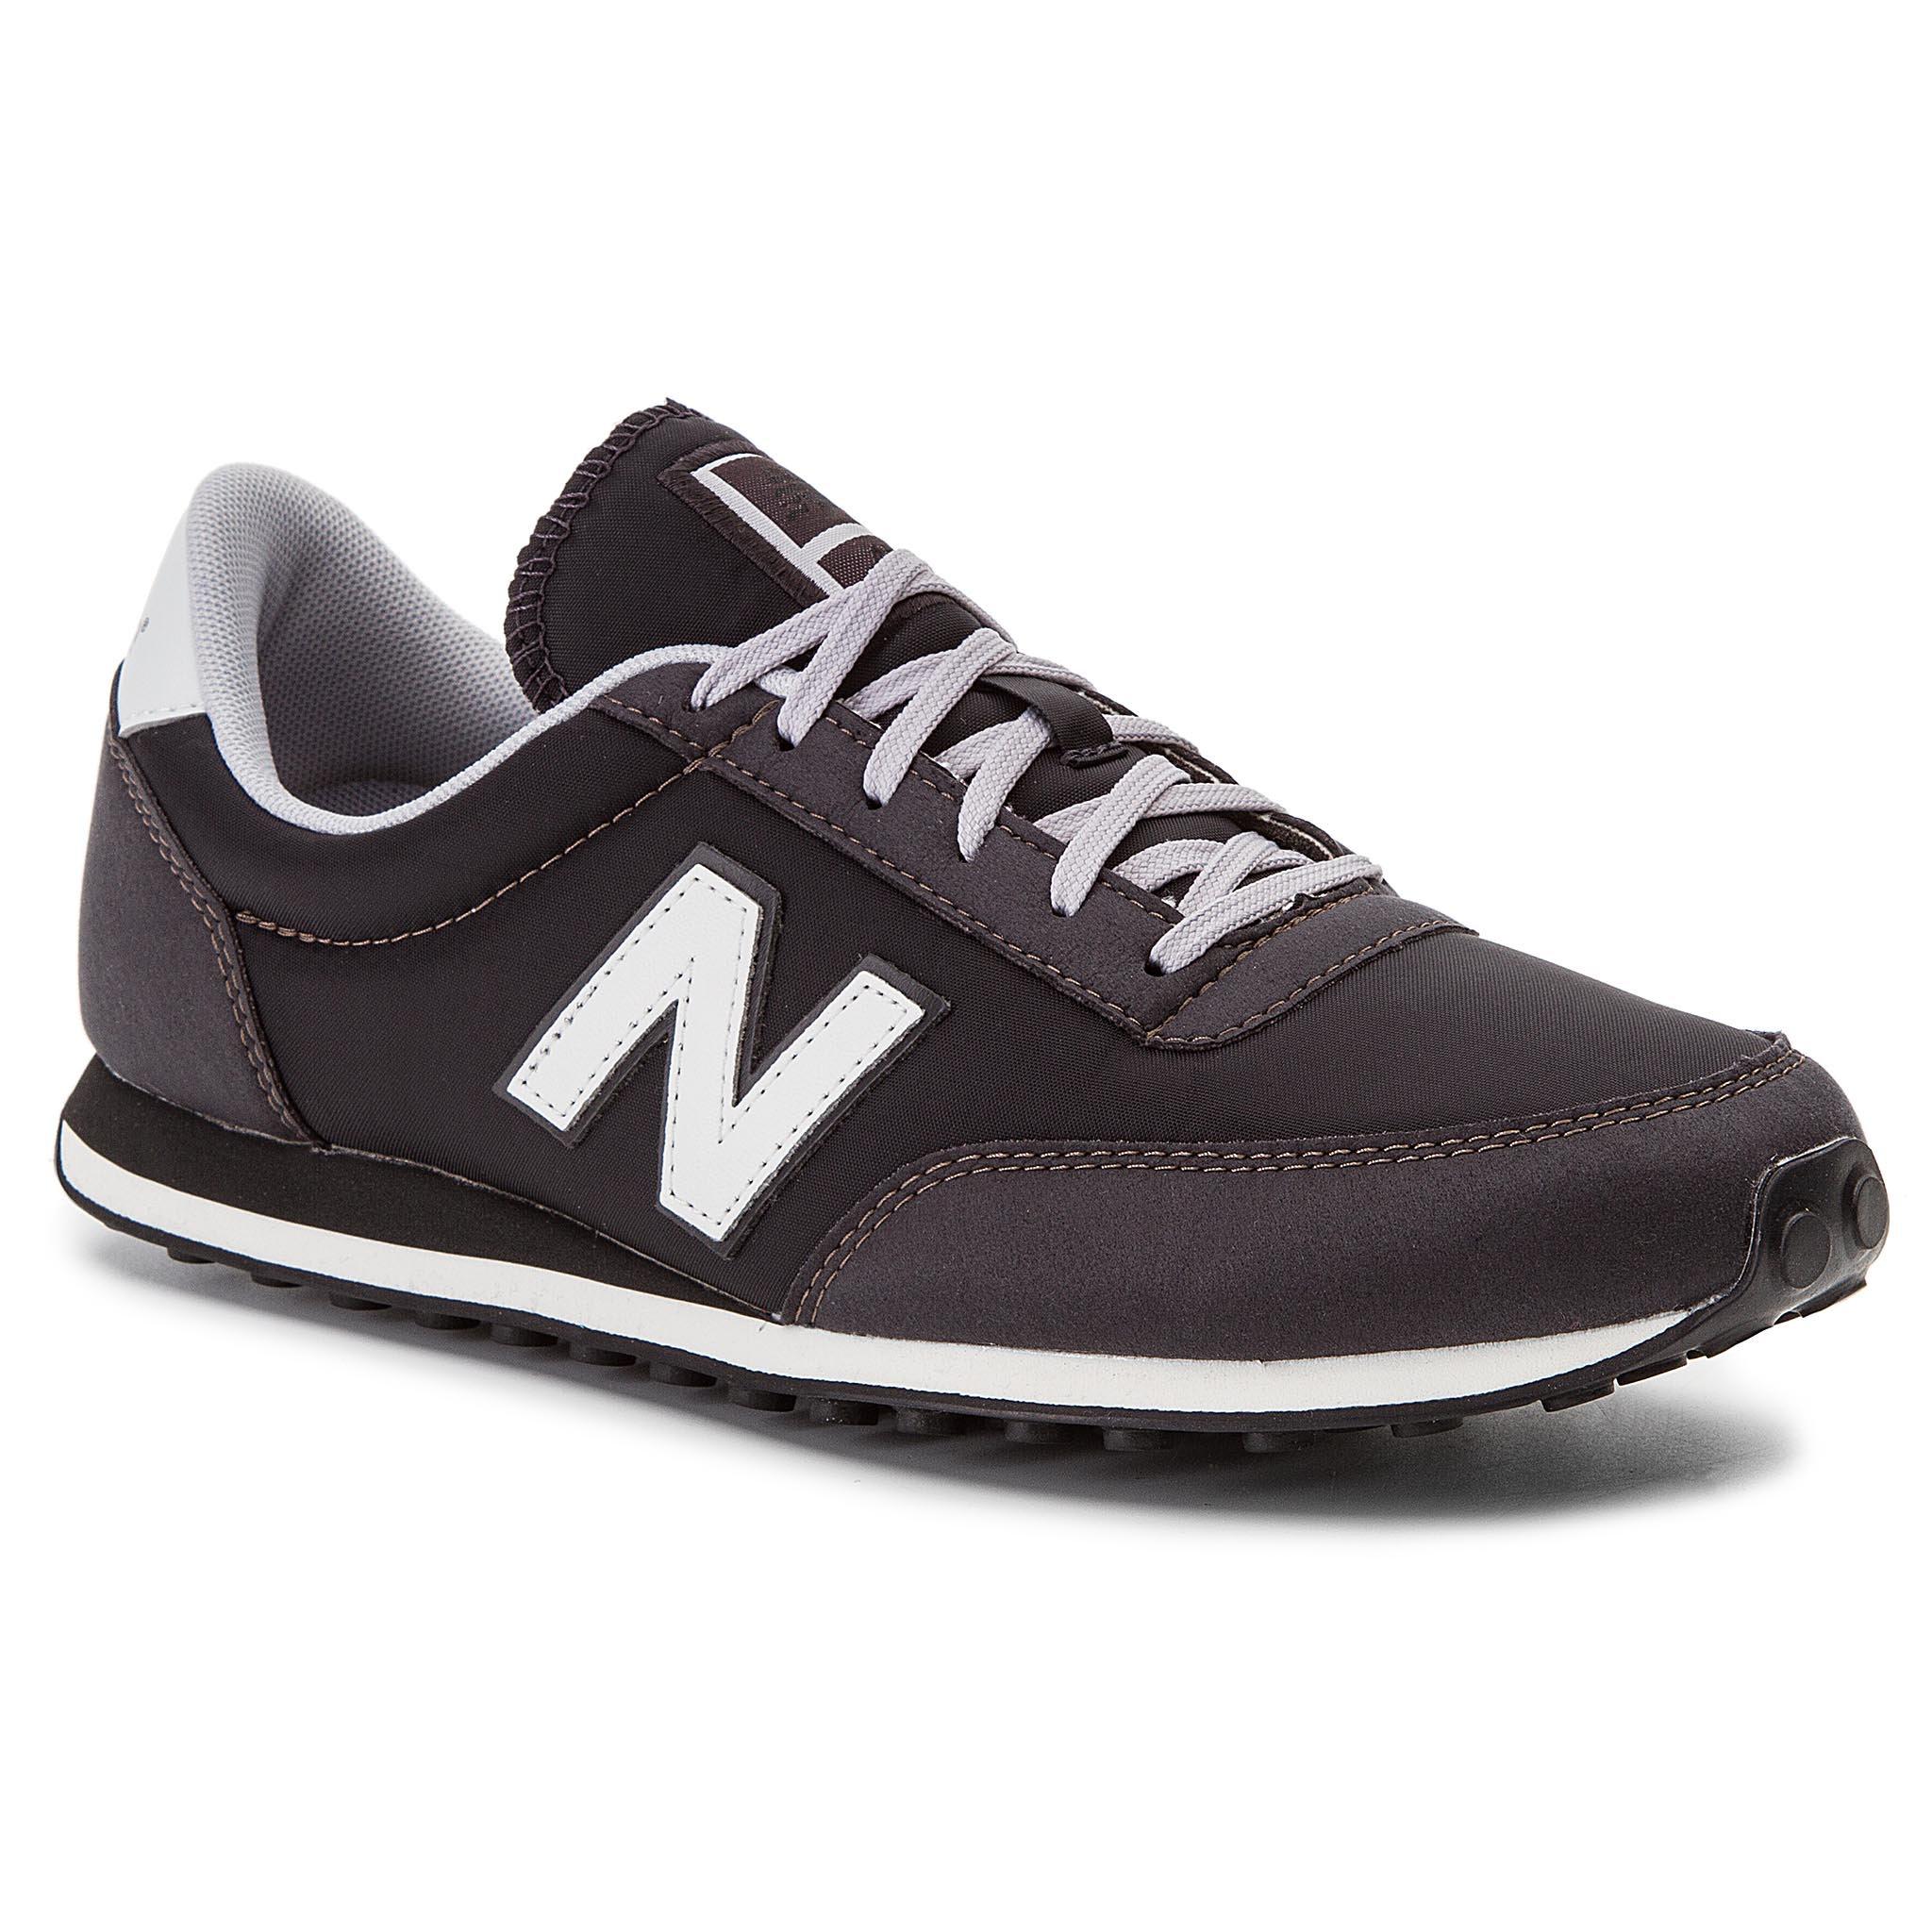 9bb30b86c4 Sportcipő New Balance U410AC Fekete Férfi - Cipők - Sportcipők -  https://ccc.eu